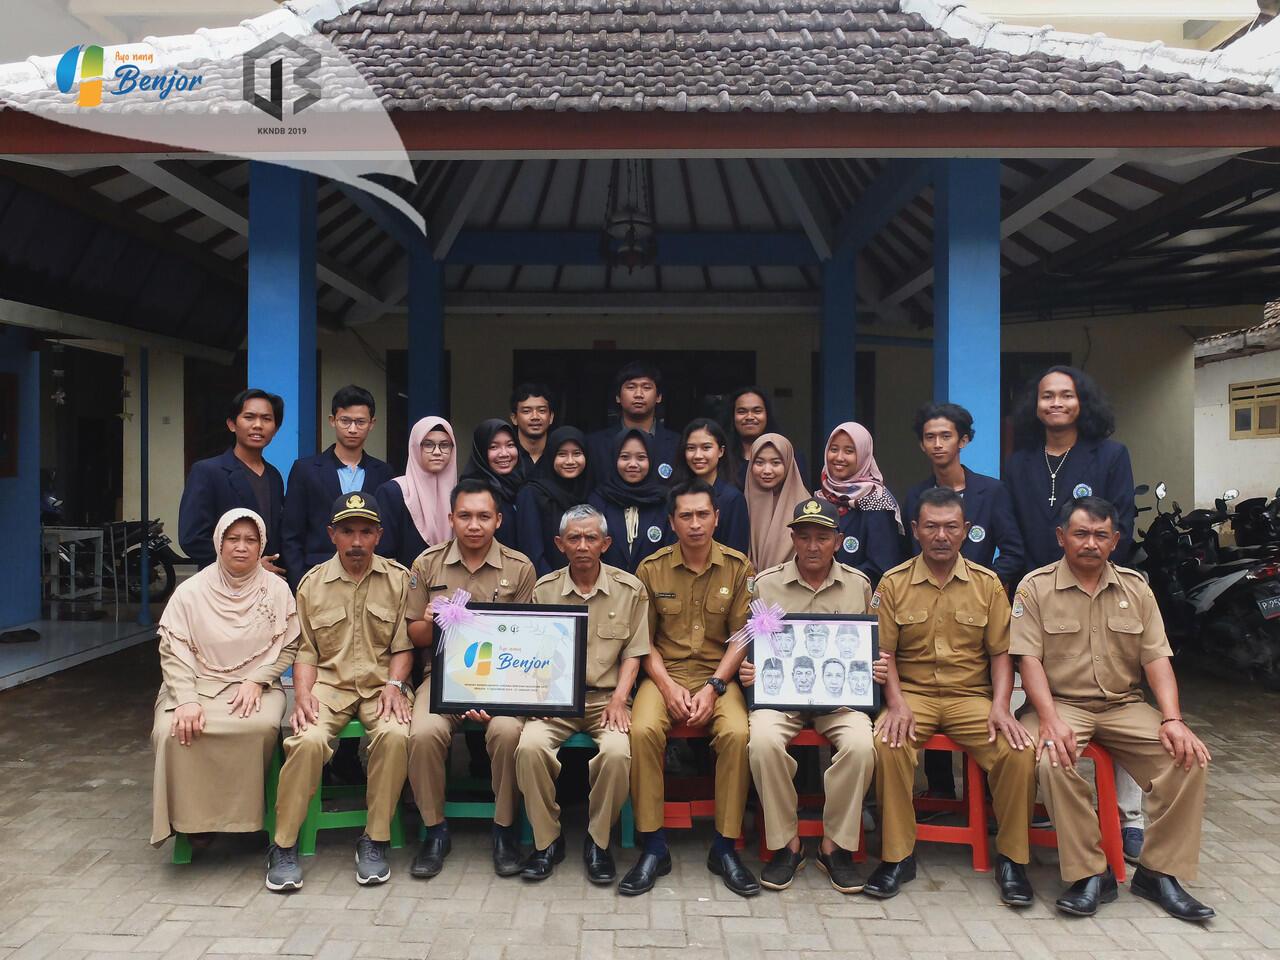 Mahasiswa KKN UM Ajak Warga Benjor Wujudkan Desa Wisata